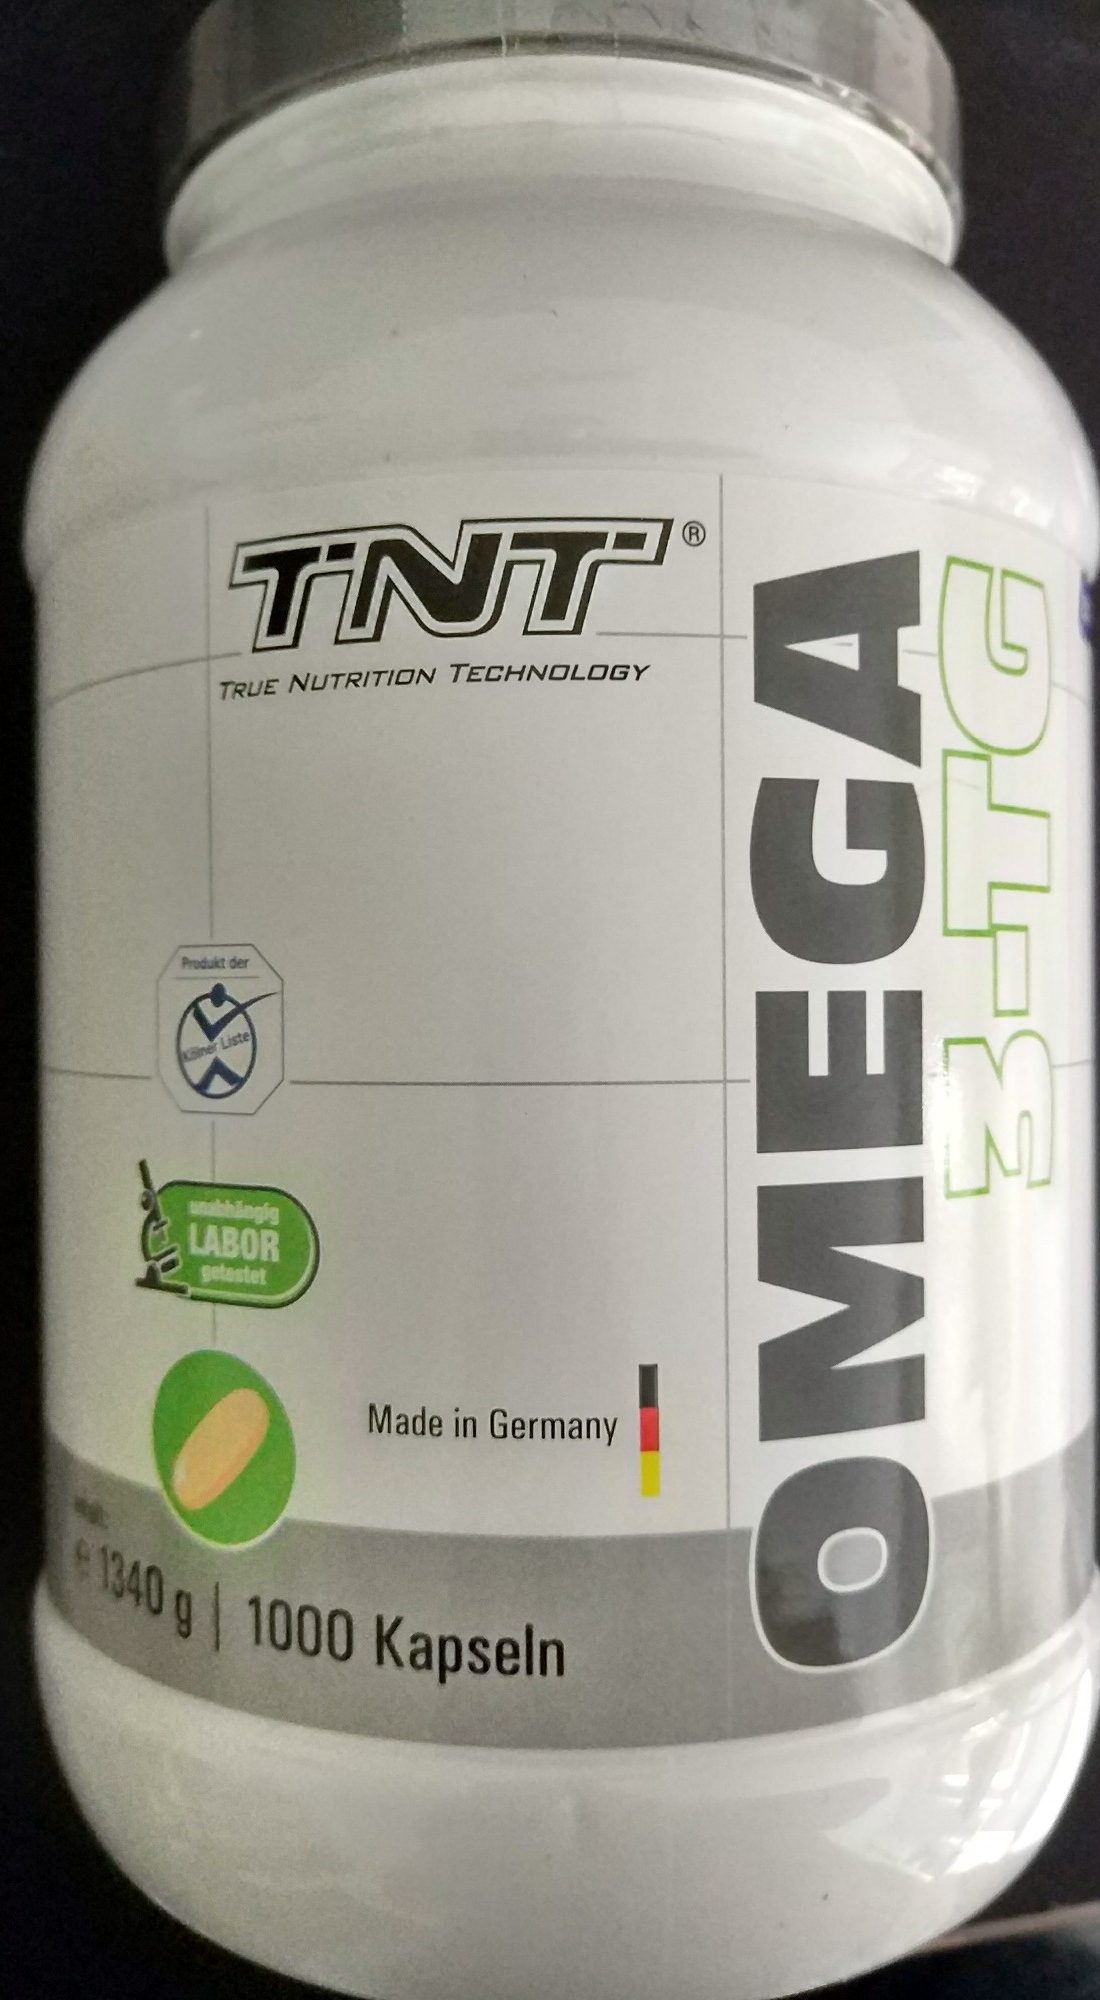 Omega 3-TG - Product